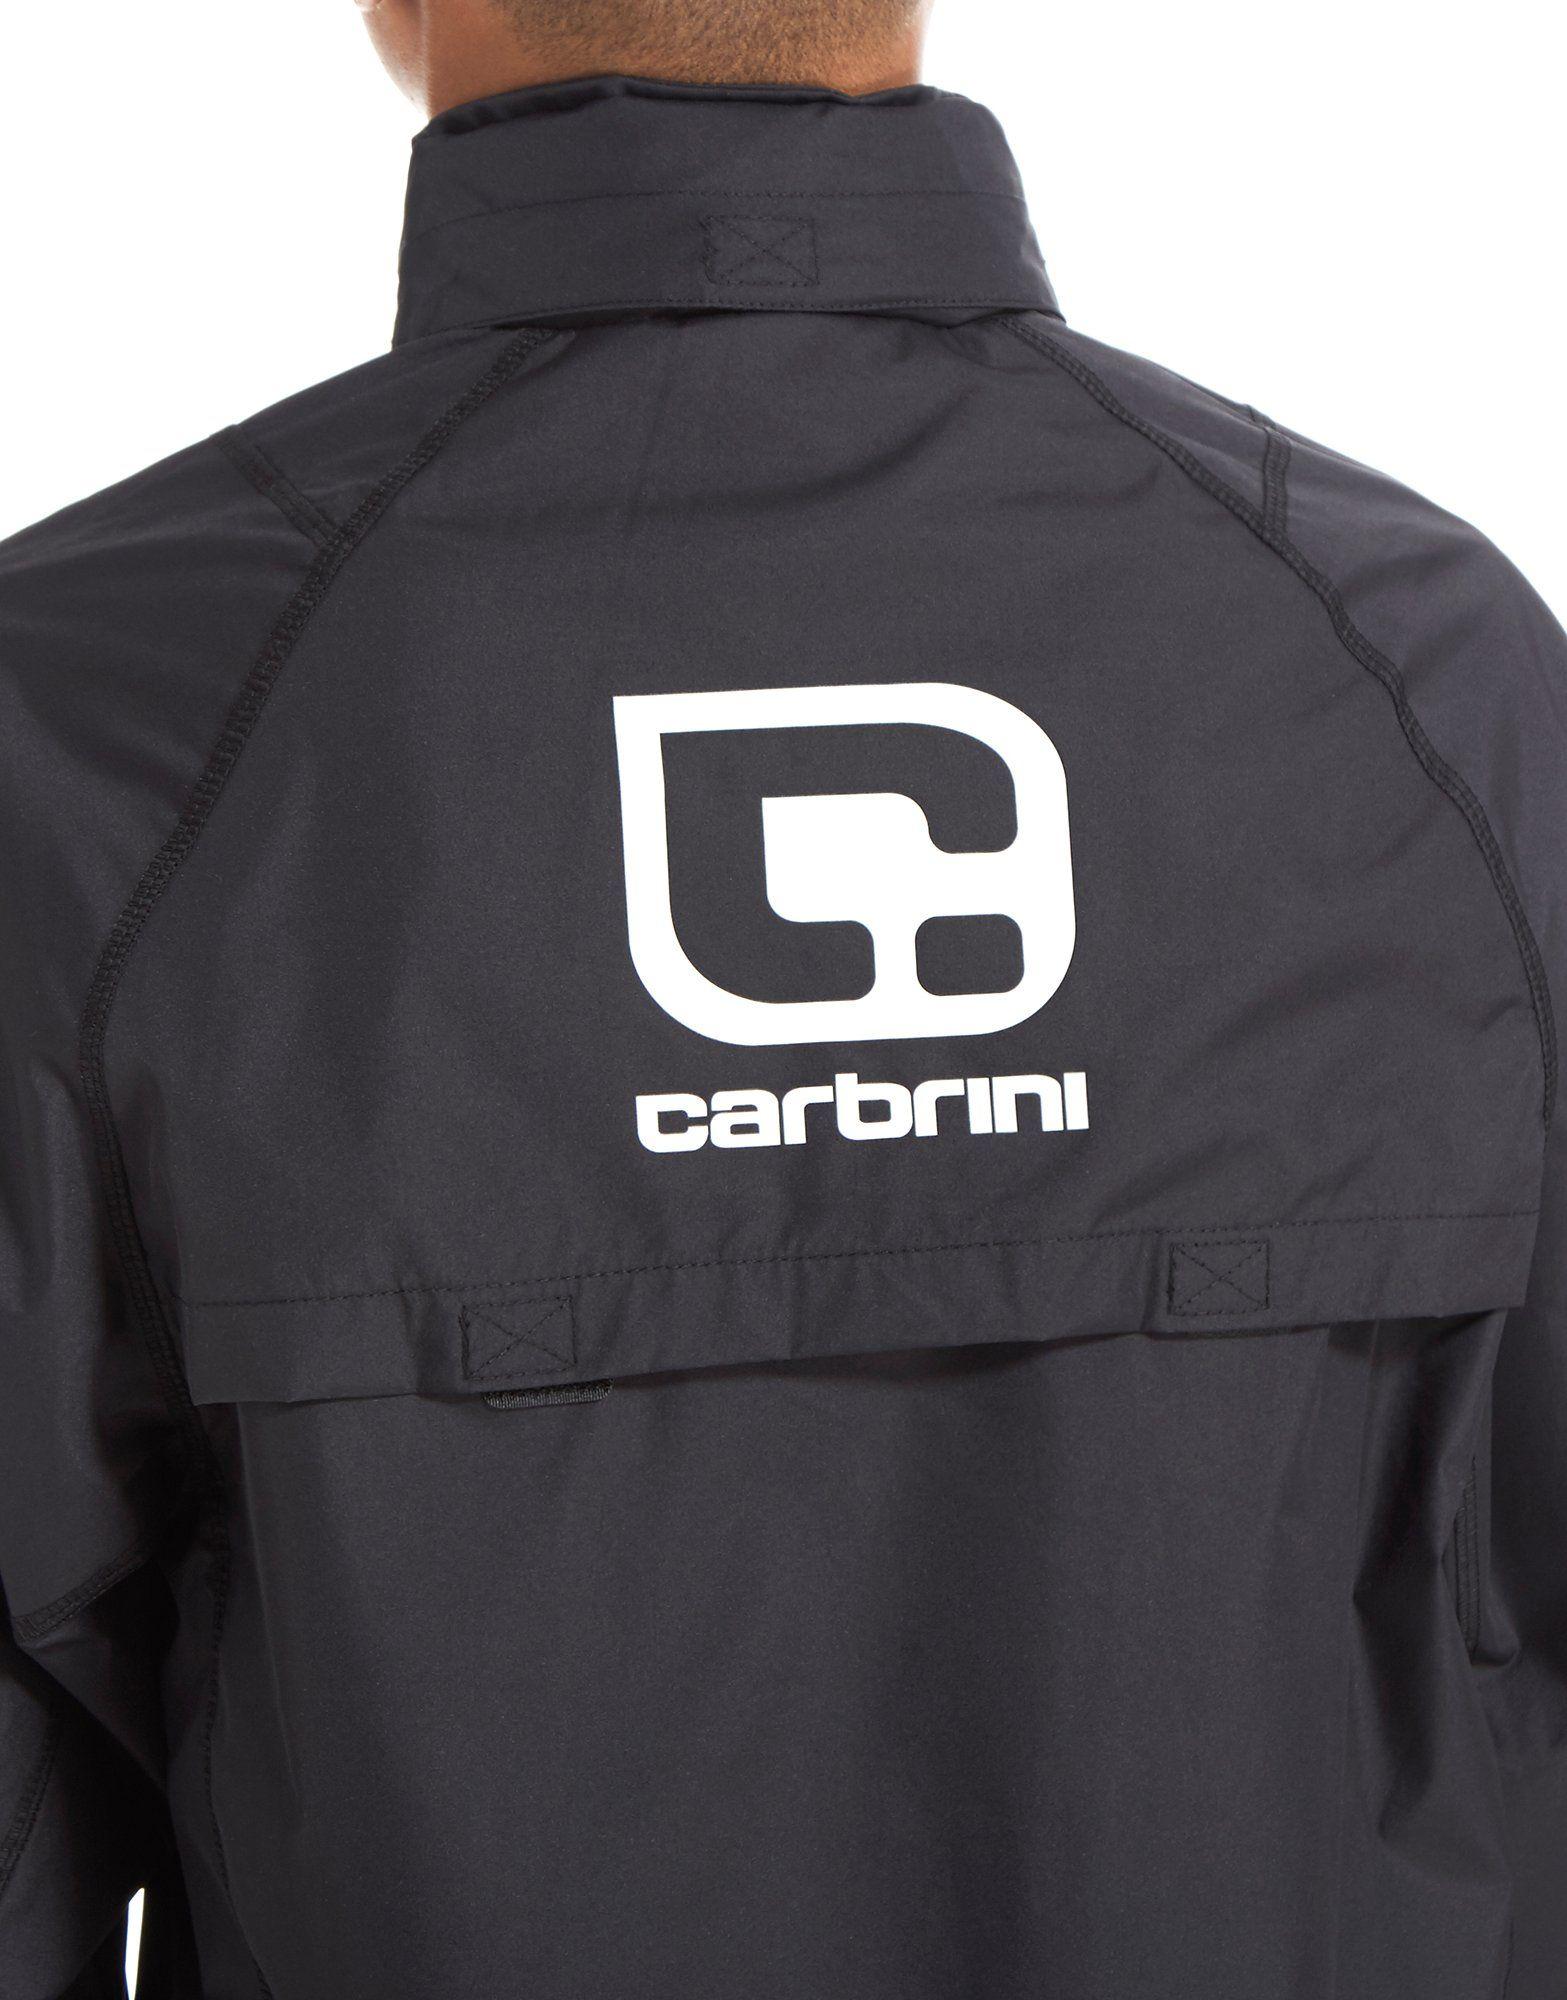 Carbrini Inverness CT 2016/ 17 Shower Jacket Junior